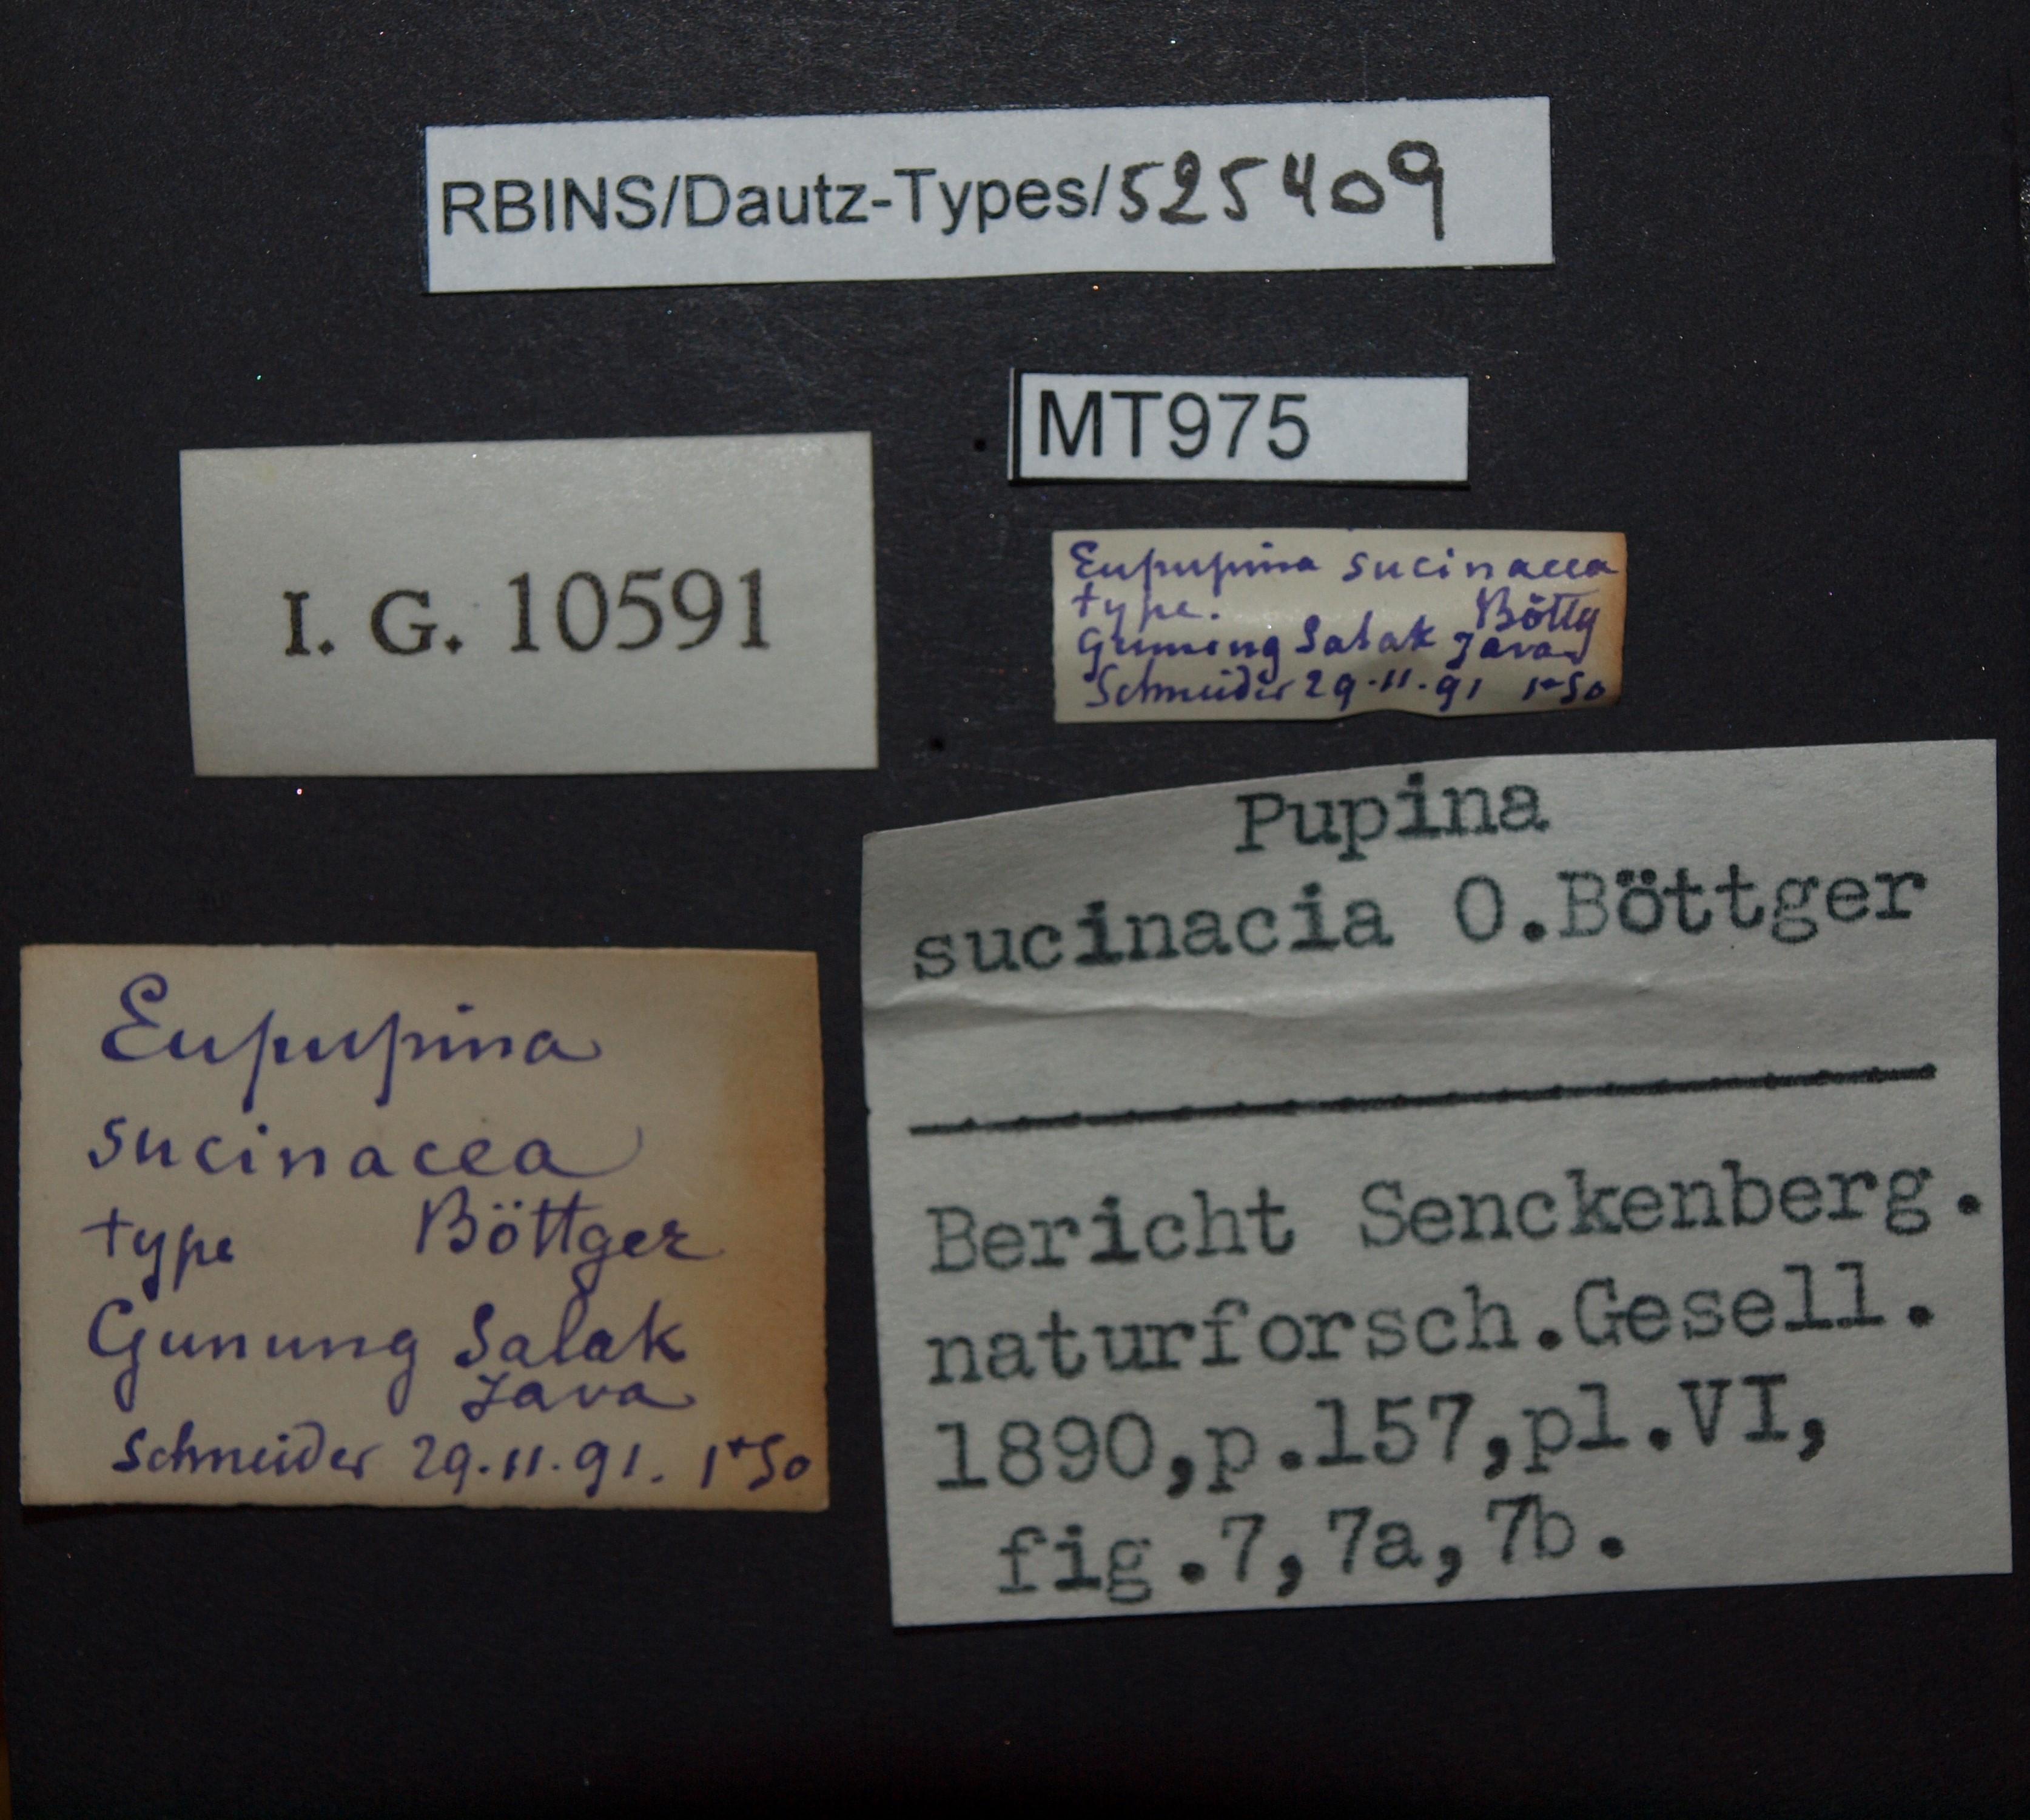 BE-RBINS-INV PARATYPE MT 975 Eupupina sucinacea LABELS.jpg